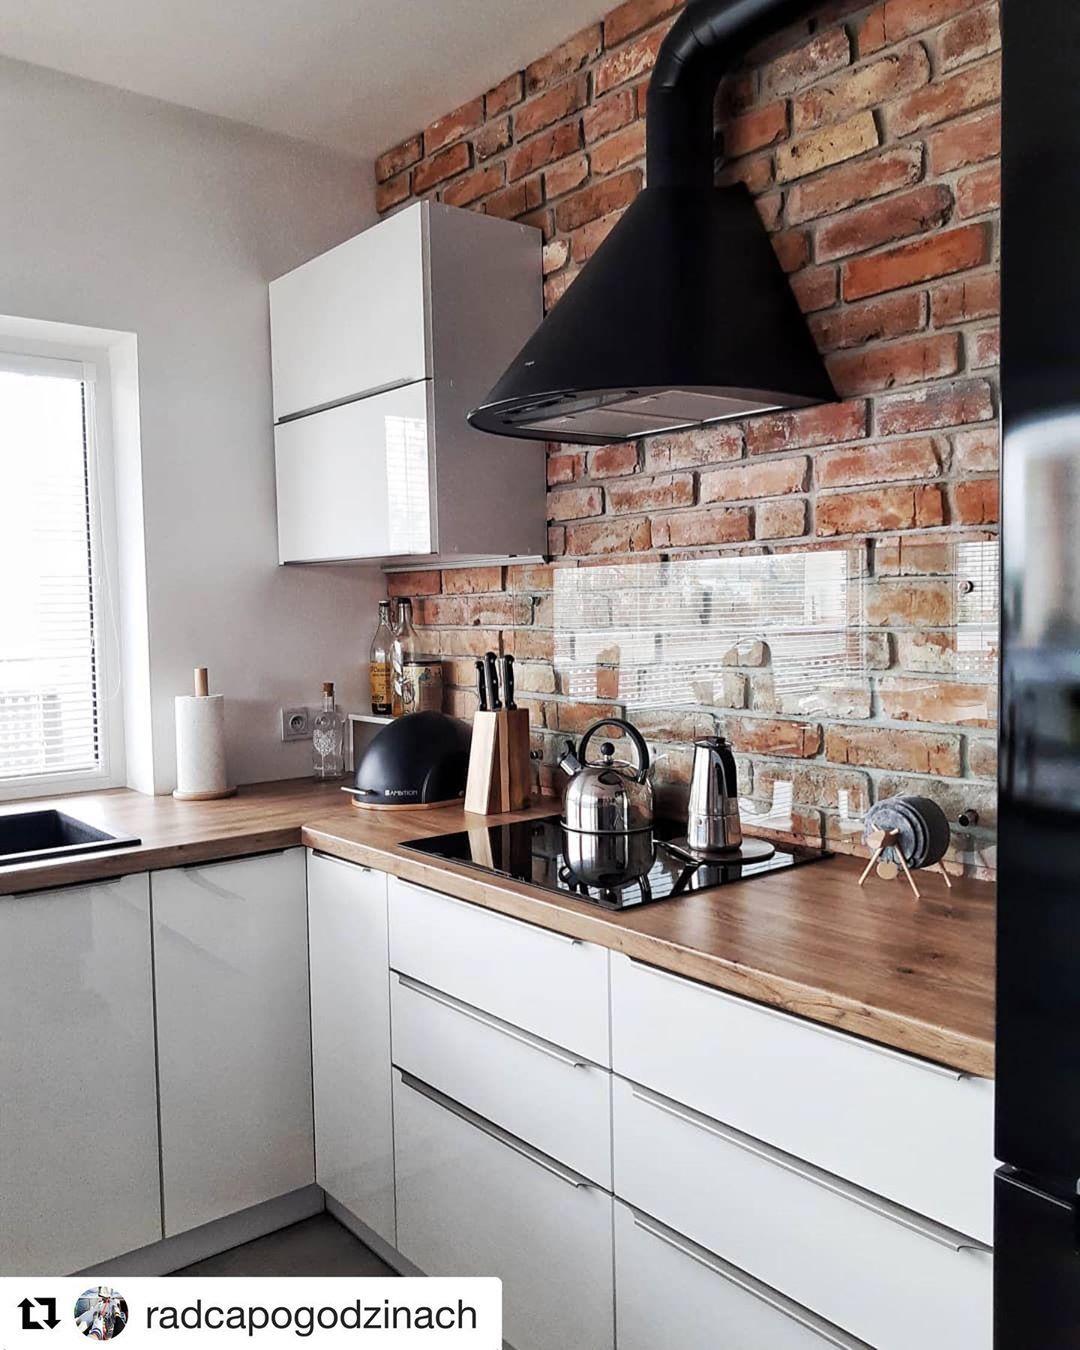 Biala Kuchnia Cegla I Czarny Okap U Radcapogodzinach Homebook Homedec Kitchen Design Kitchen Interior Kitchen Inspirations